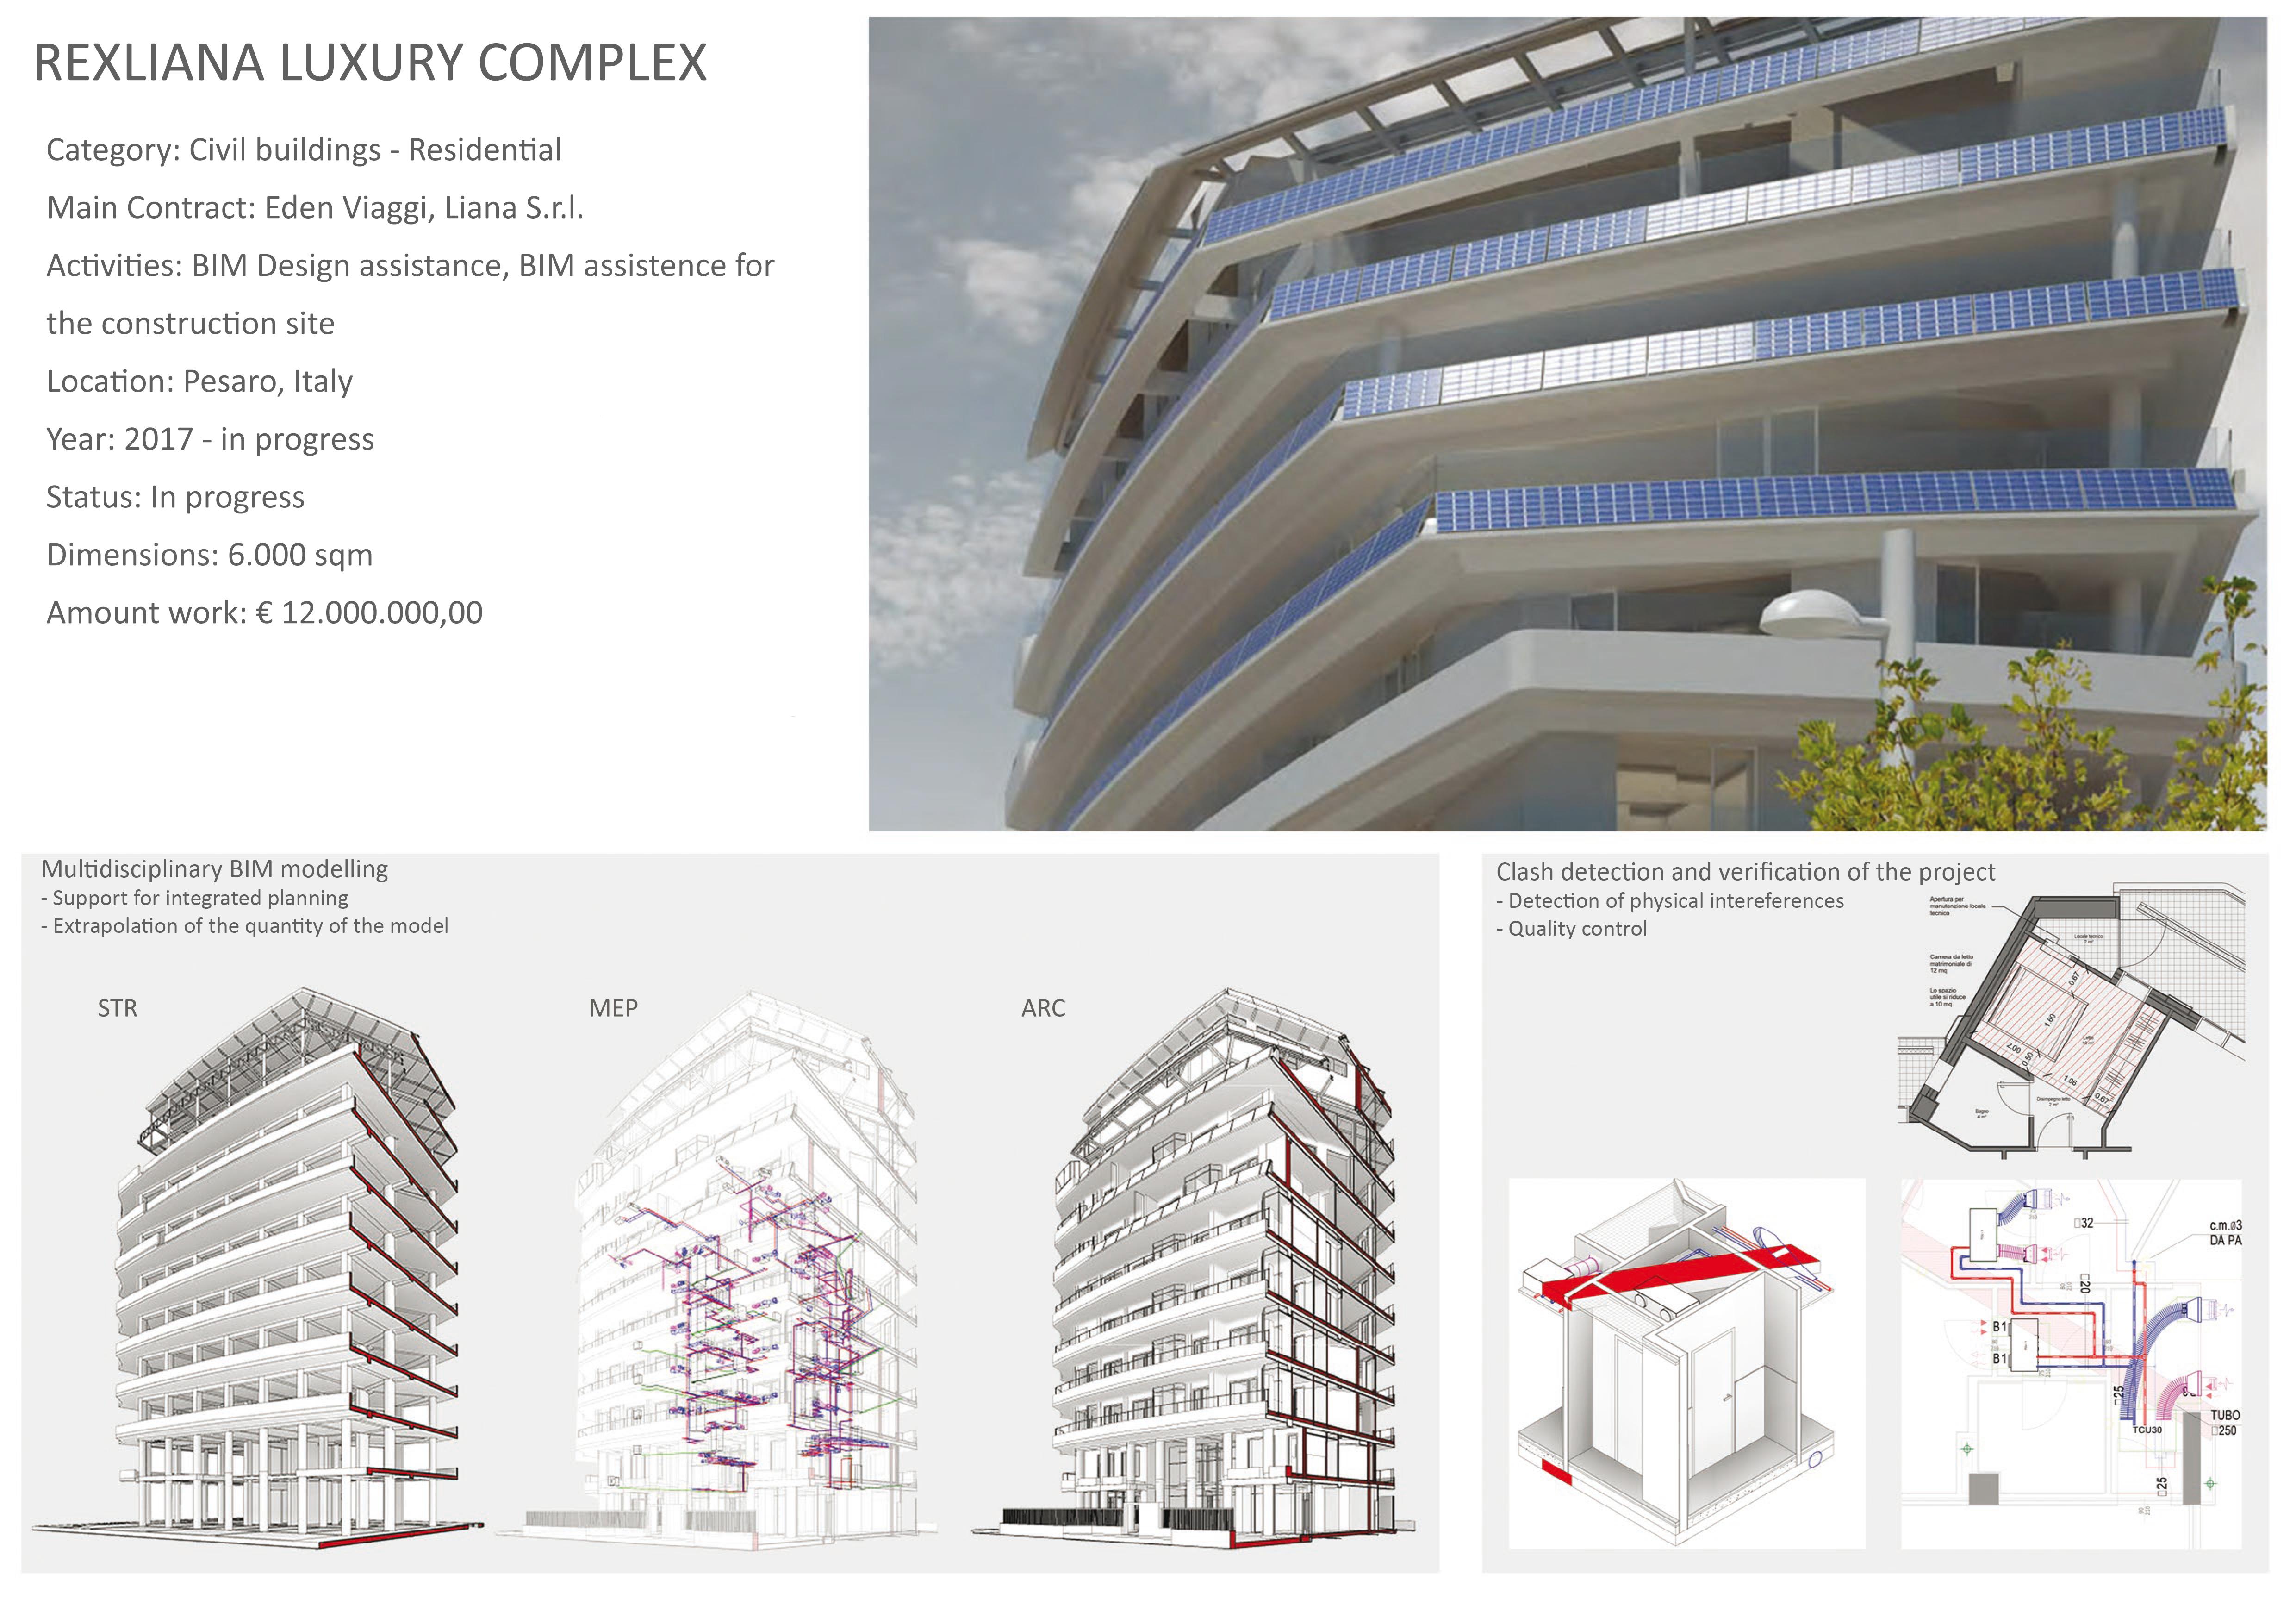 Complesso residenziale RexLiana